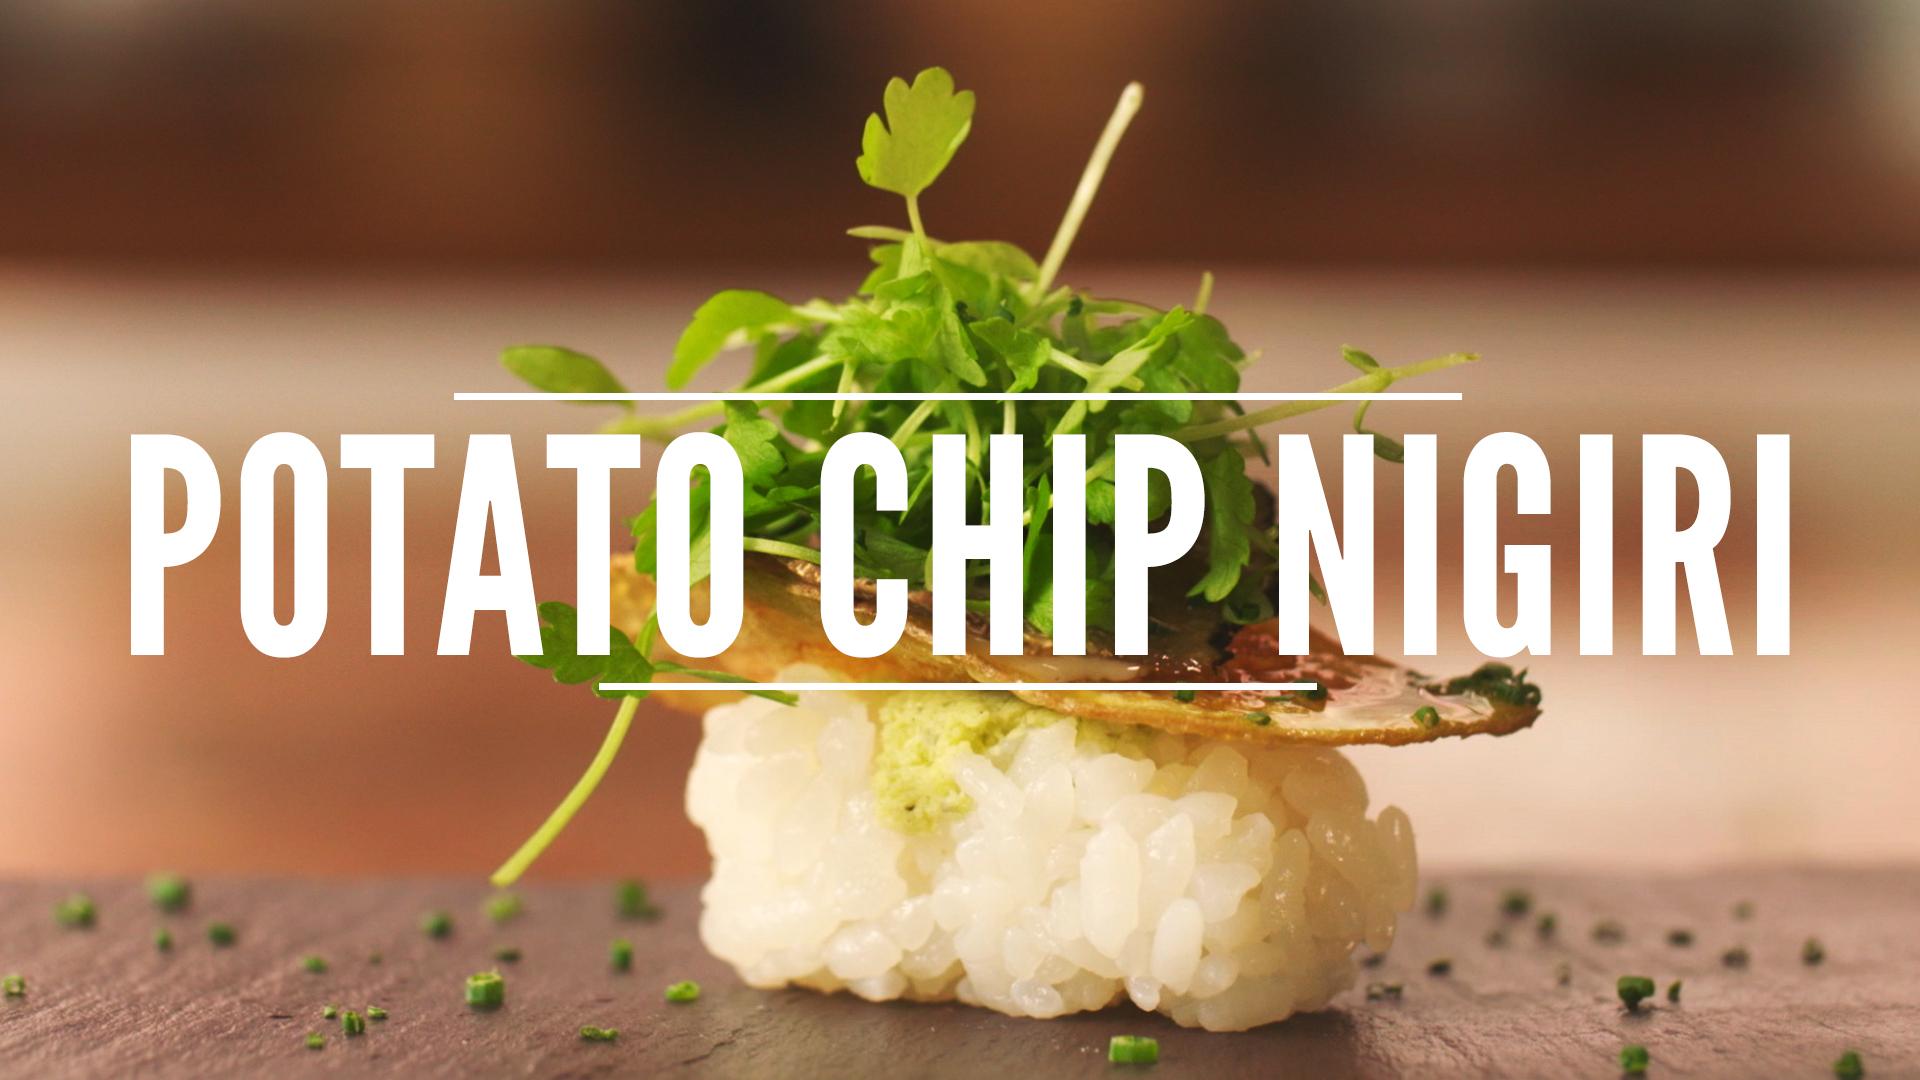 Tim Cushman Adds Potato Crunch to His Nigiri | The Dish